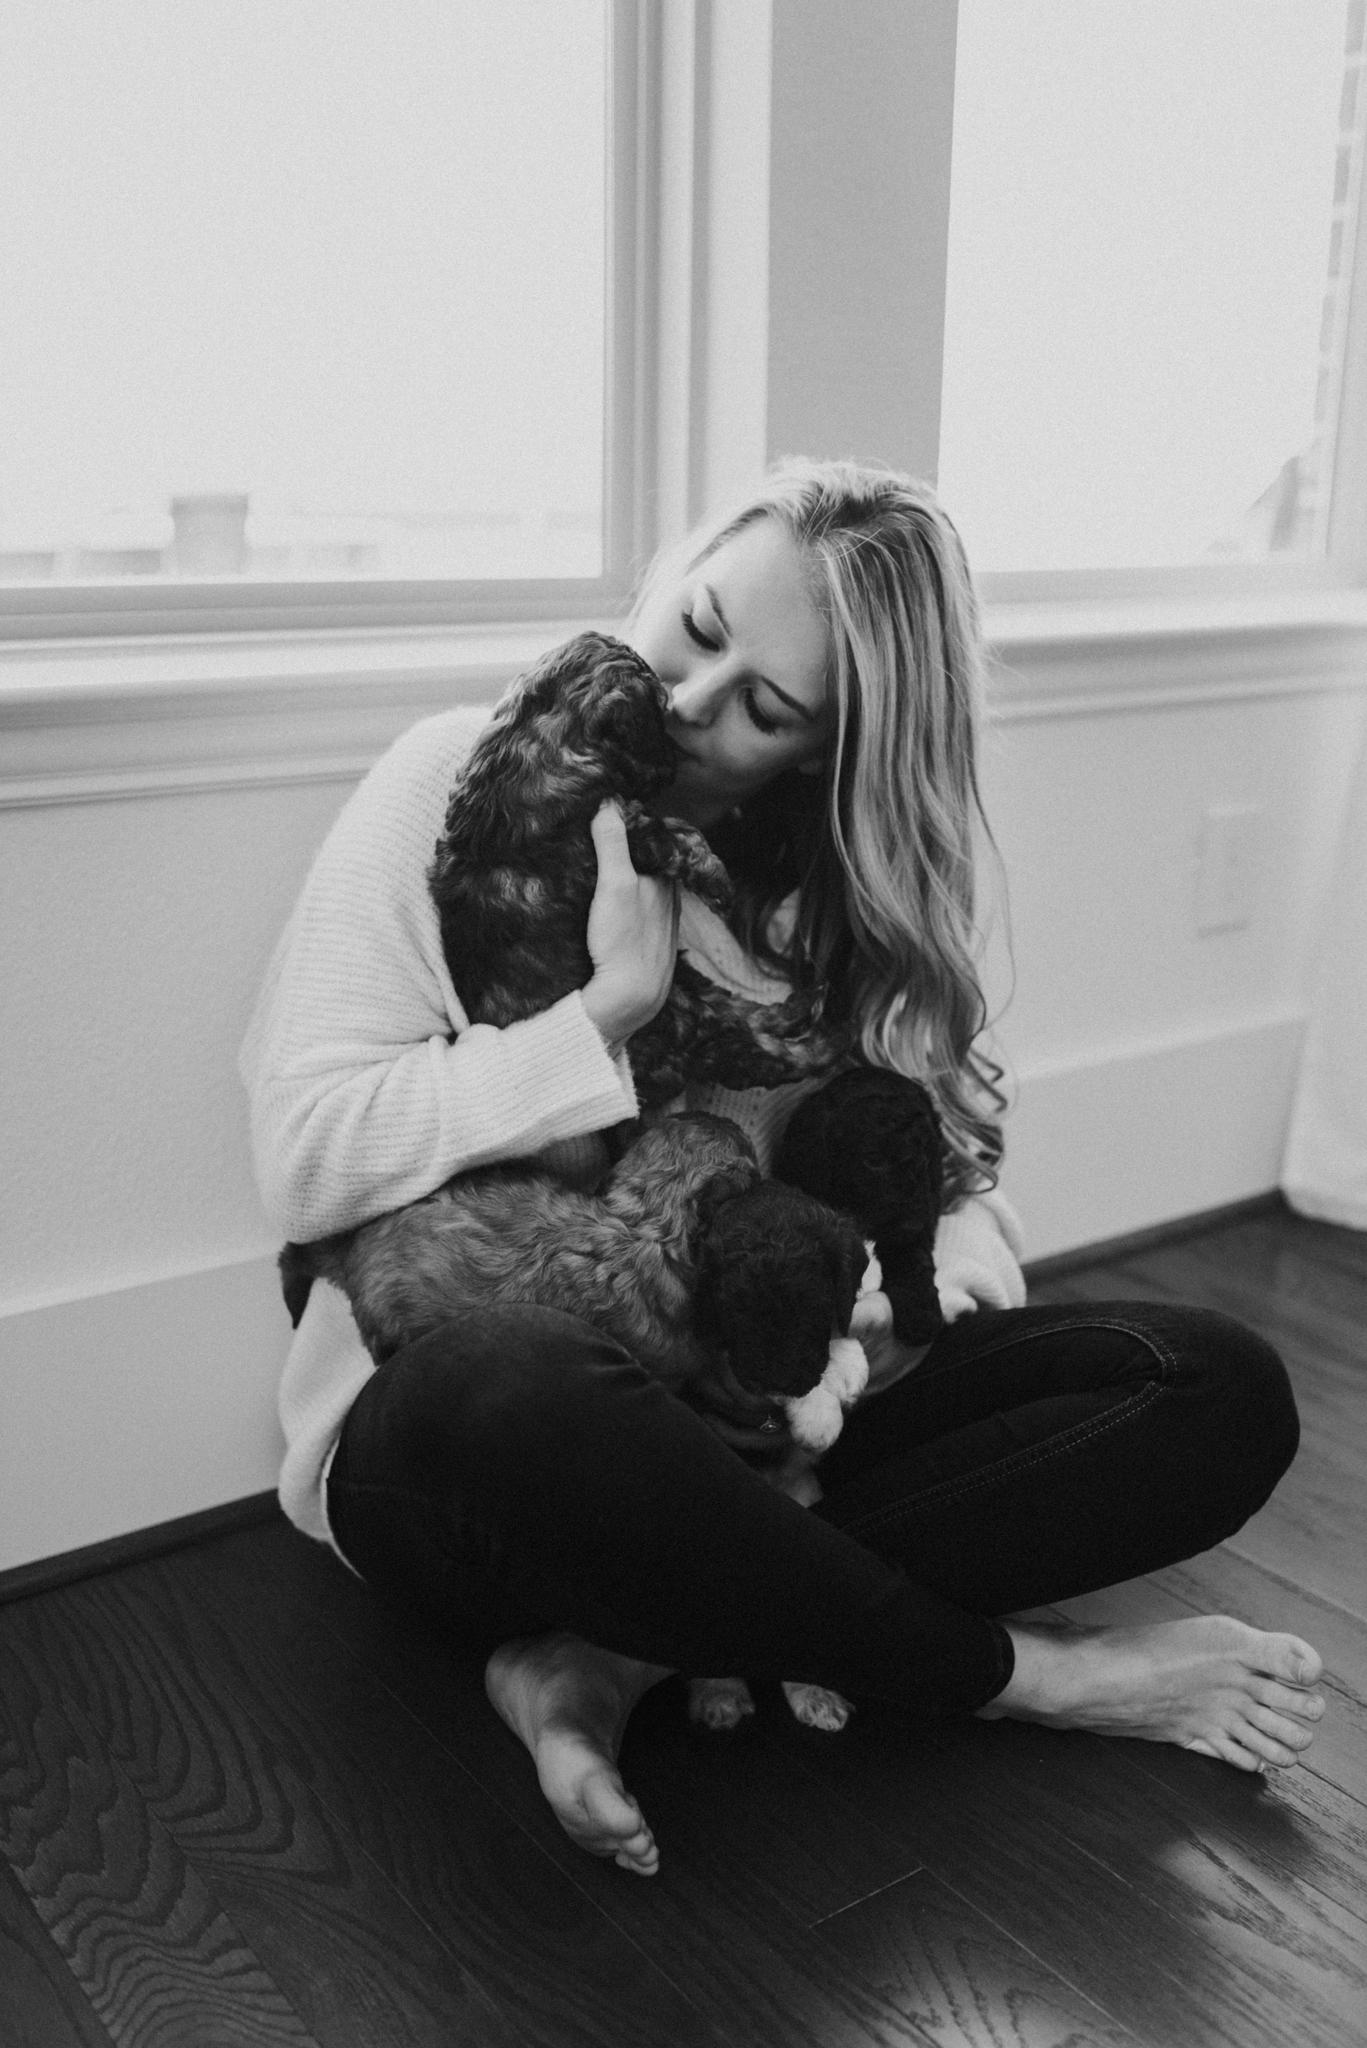 houston-wedding-photographer-in-home-maternity-session-puppies- Houston Wedding Photographer -Kristen Giles Photography-64.jpg